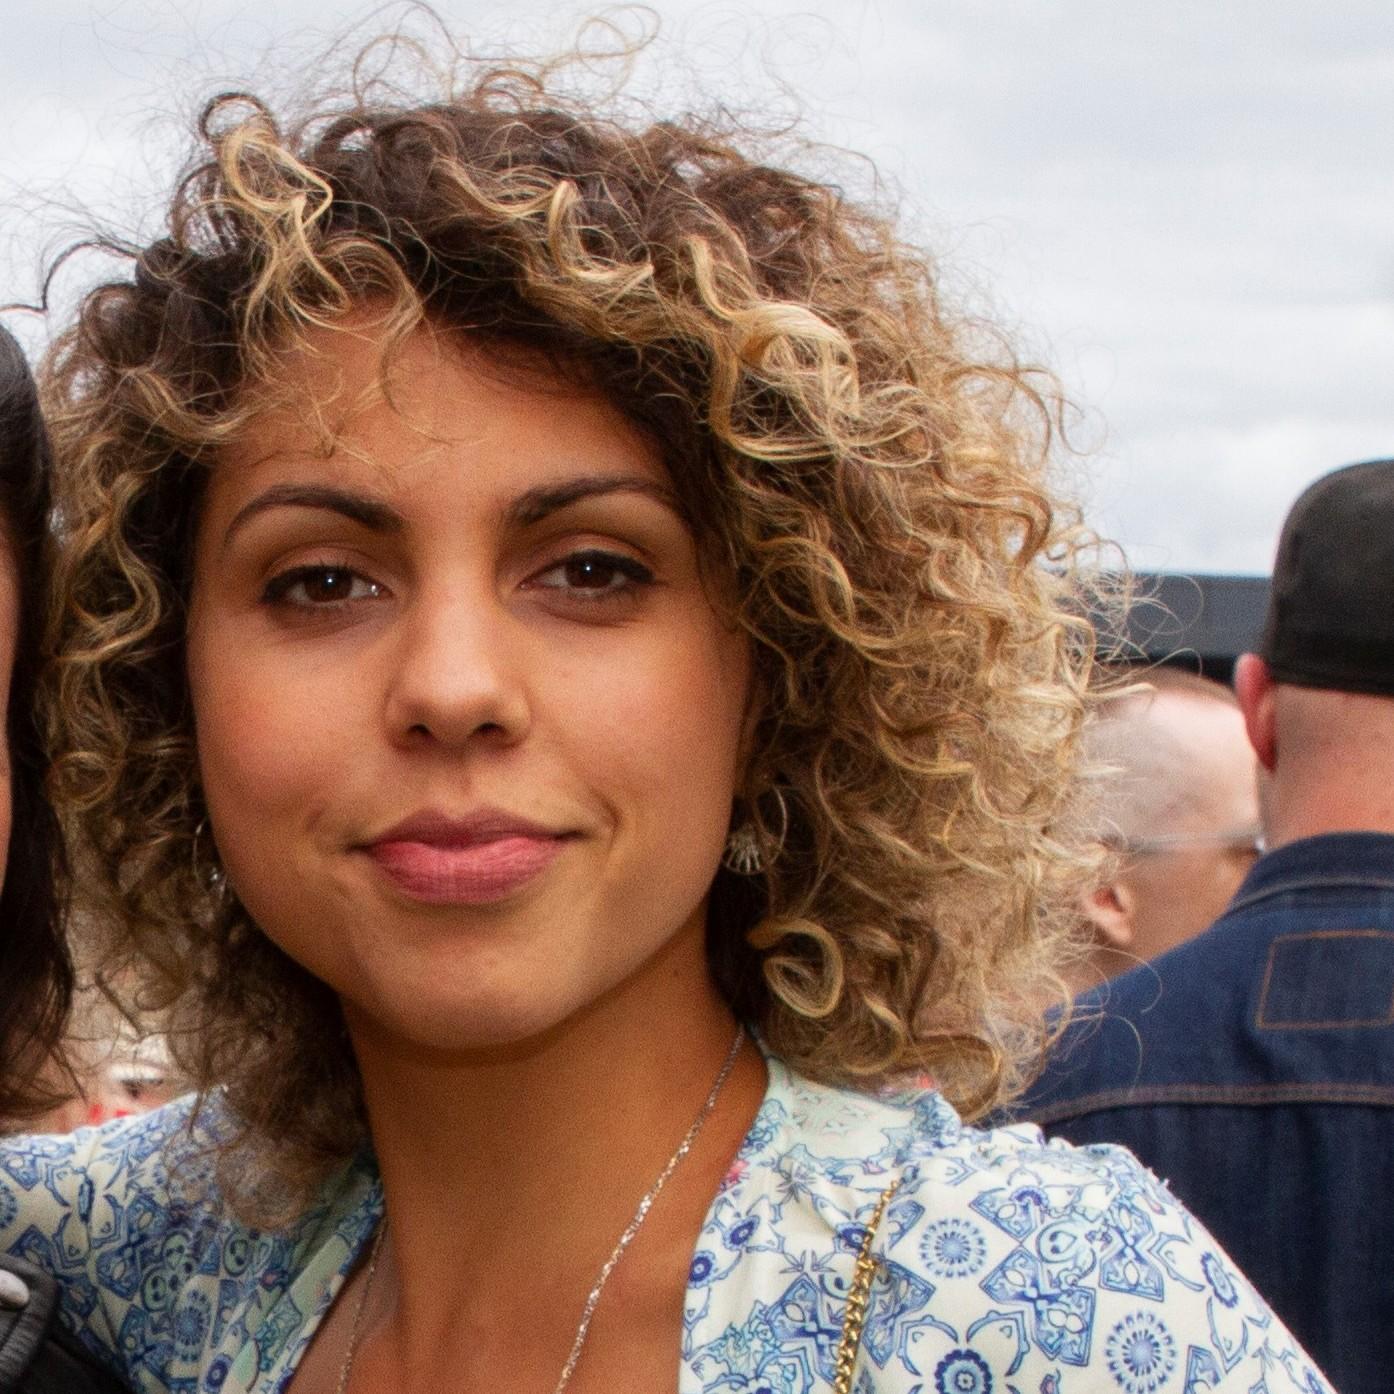 Jess Salgueiro - Wikipedia